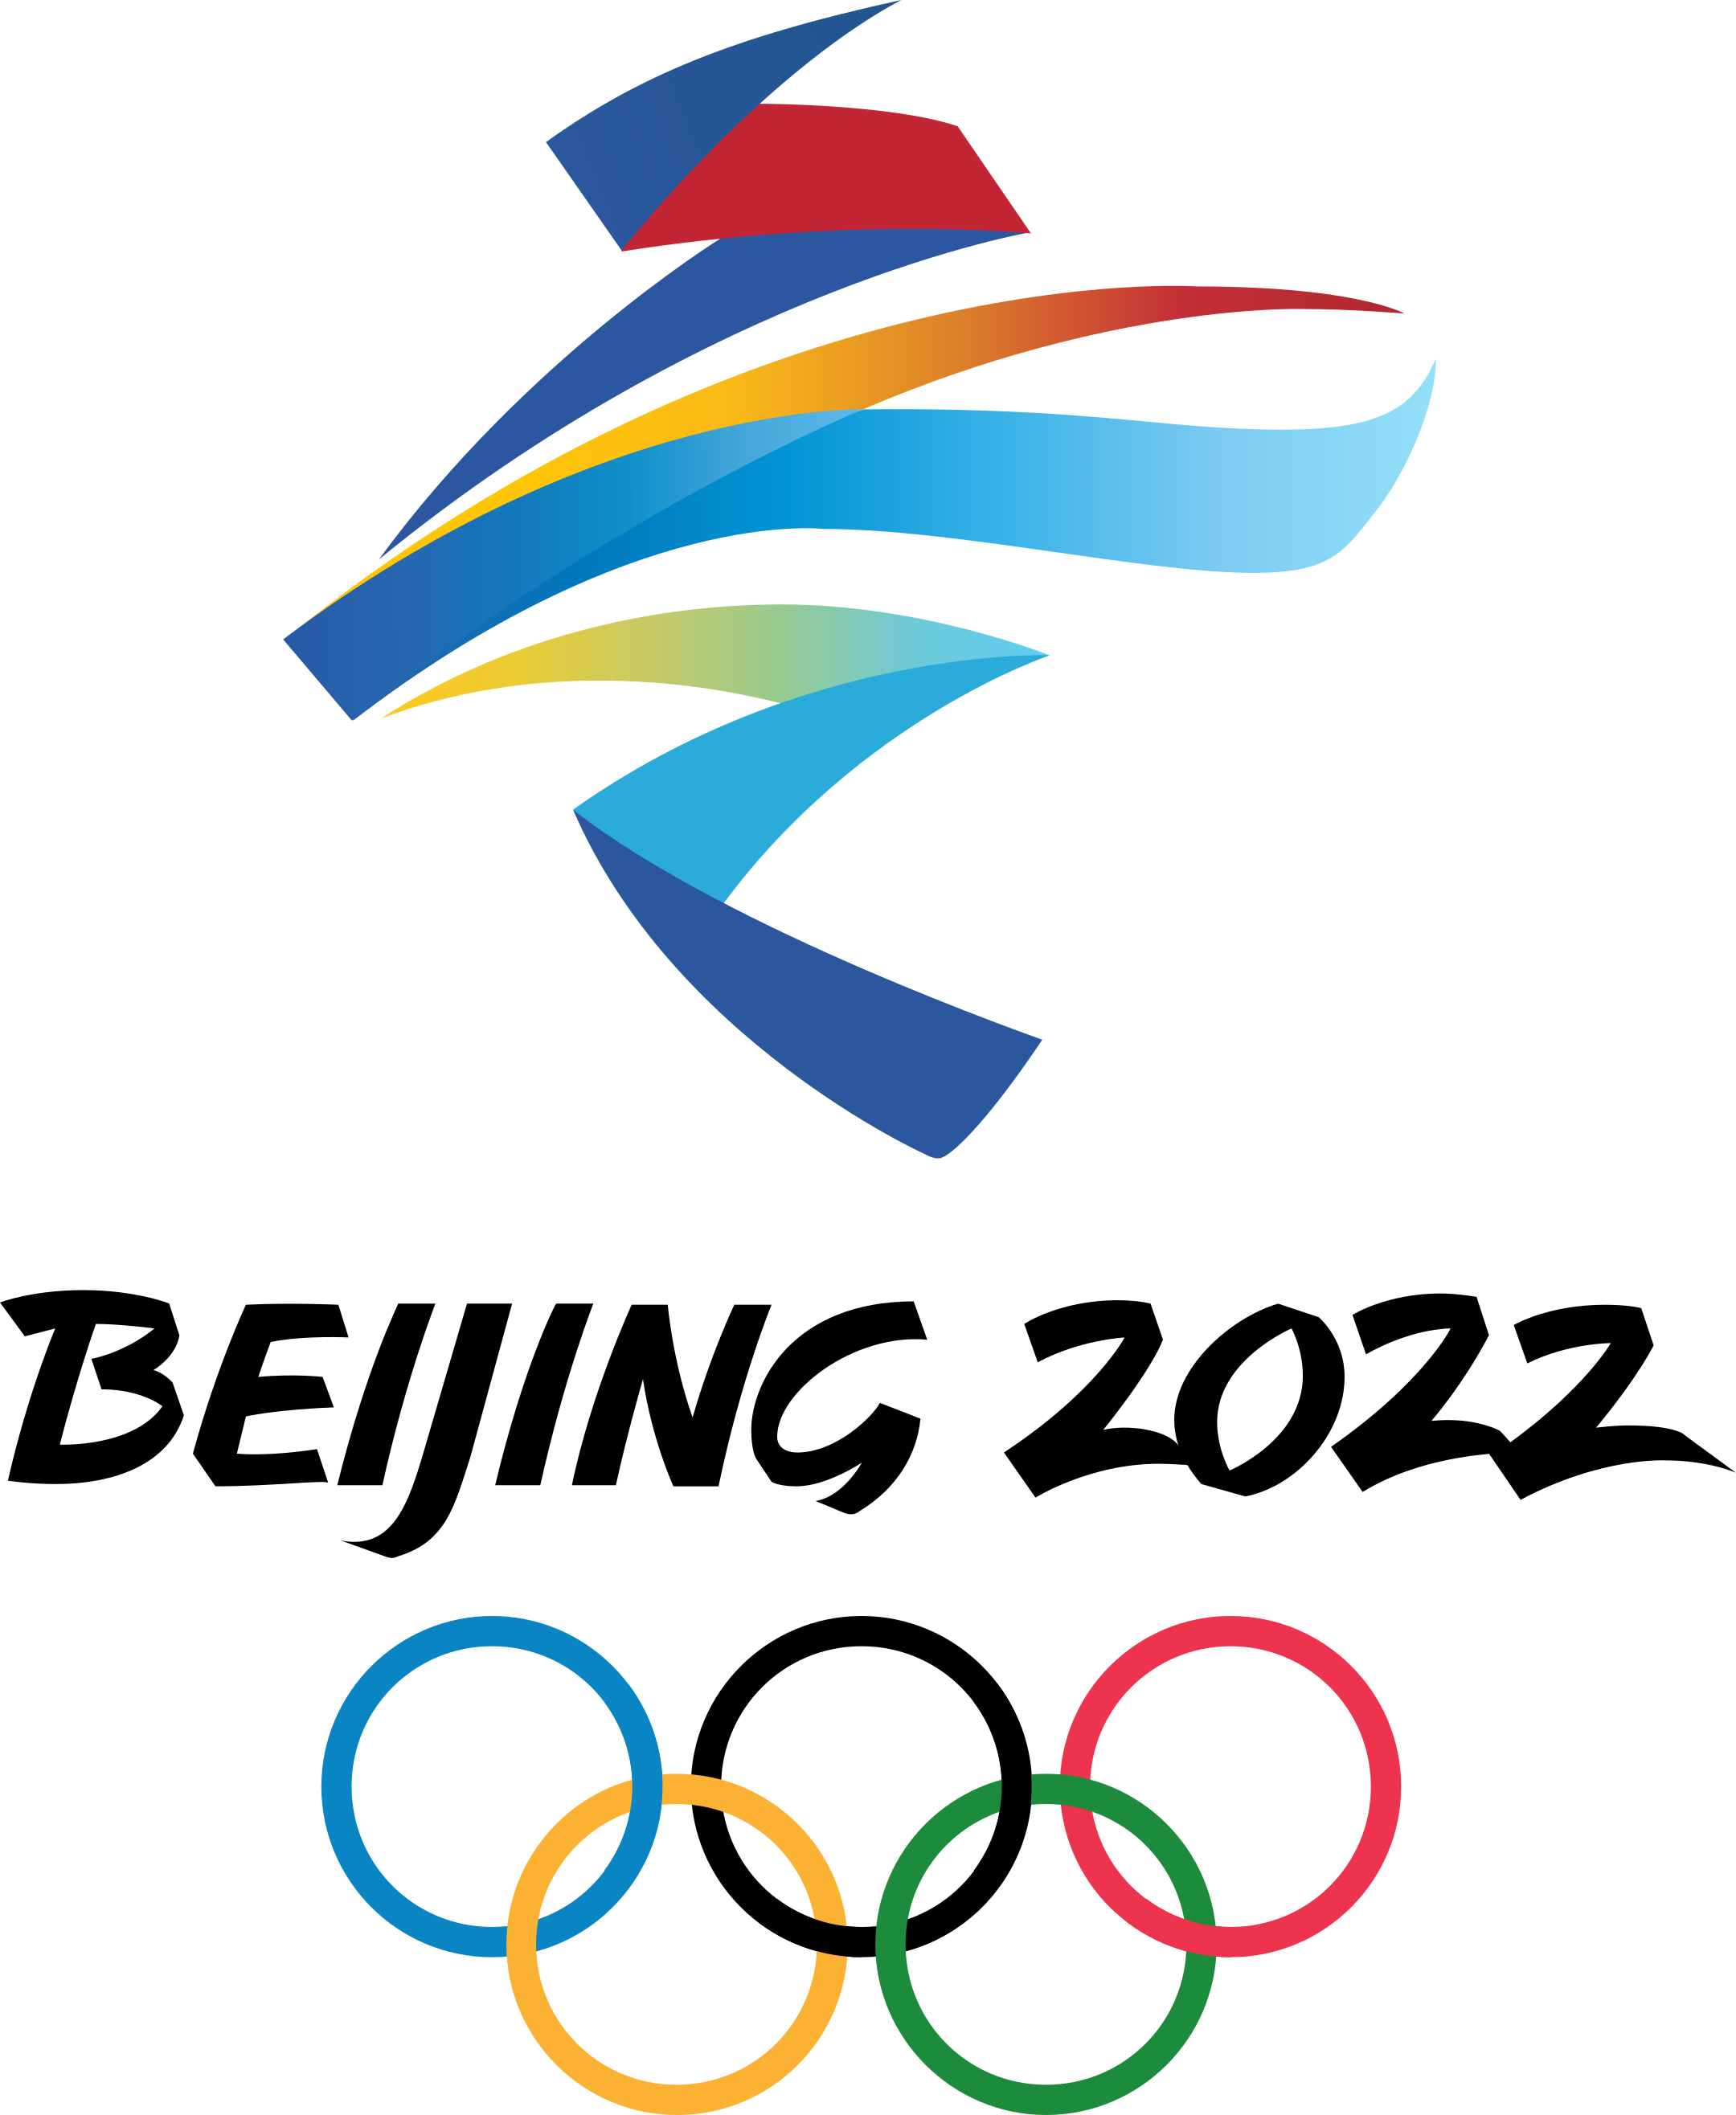 beijing 2022 logo 1 - Beijing 2022 Logo